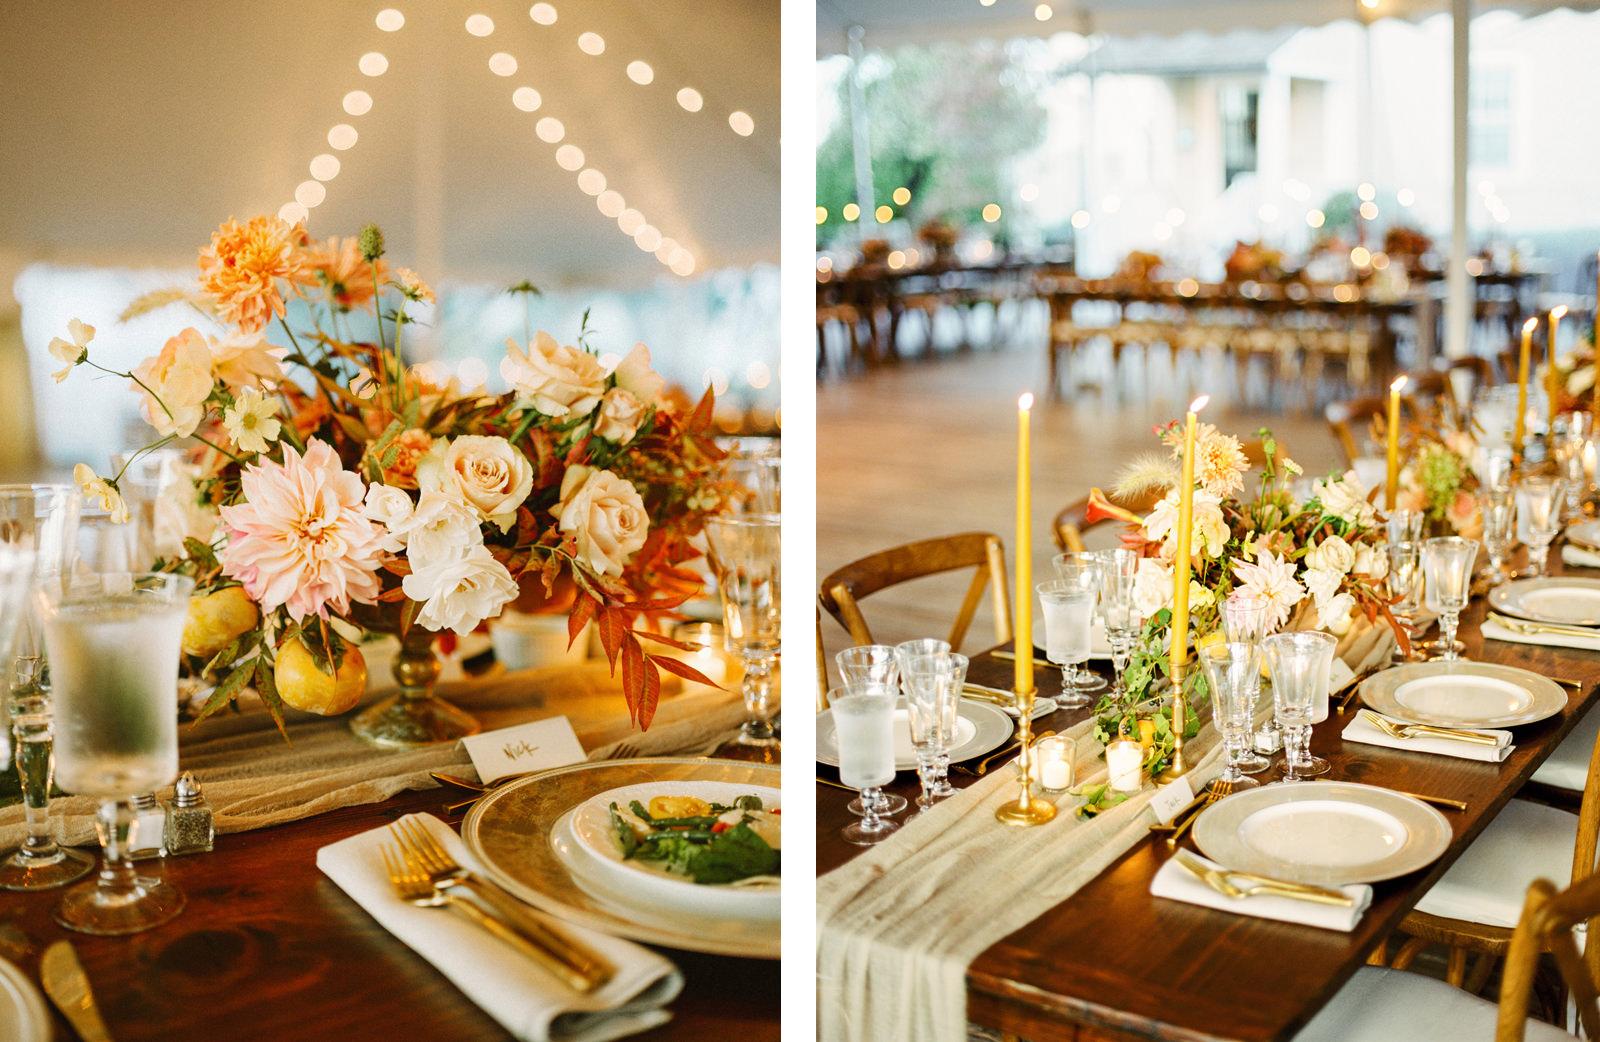 bridgeport-wedding-135 BRIDGEPORT, CONNECTICUT BACKYARD WEDDING